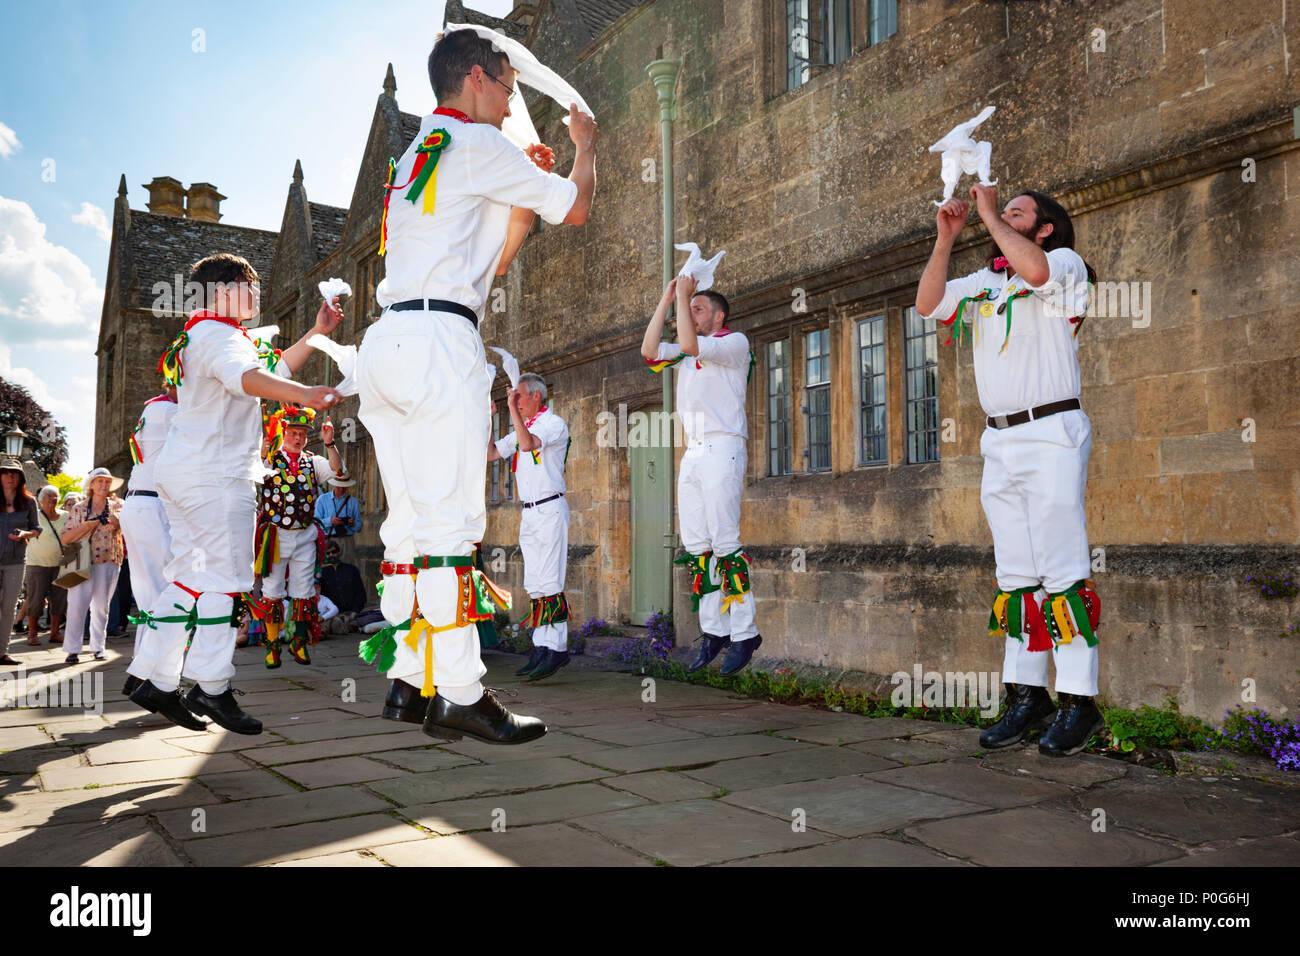 Morris Dance fuera del Chipping Campden Scuttlebrook Almshouses durante el velatorio, Chipping Campden, Cotswolds, Gloucestershire, Inglaterra, Reino Unido. Imagen De Stock